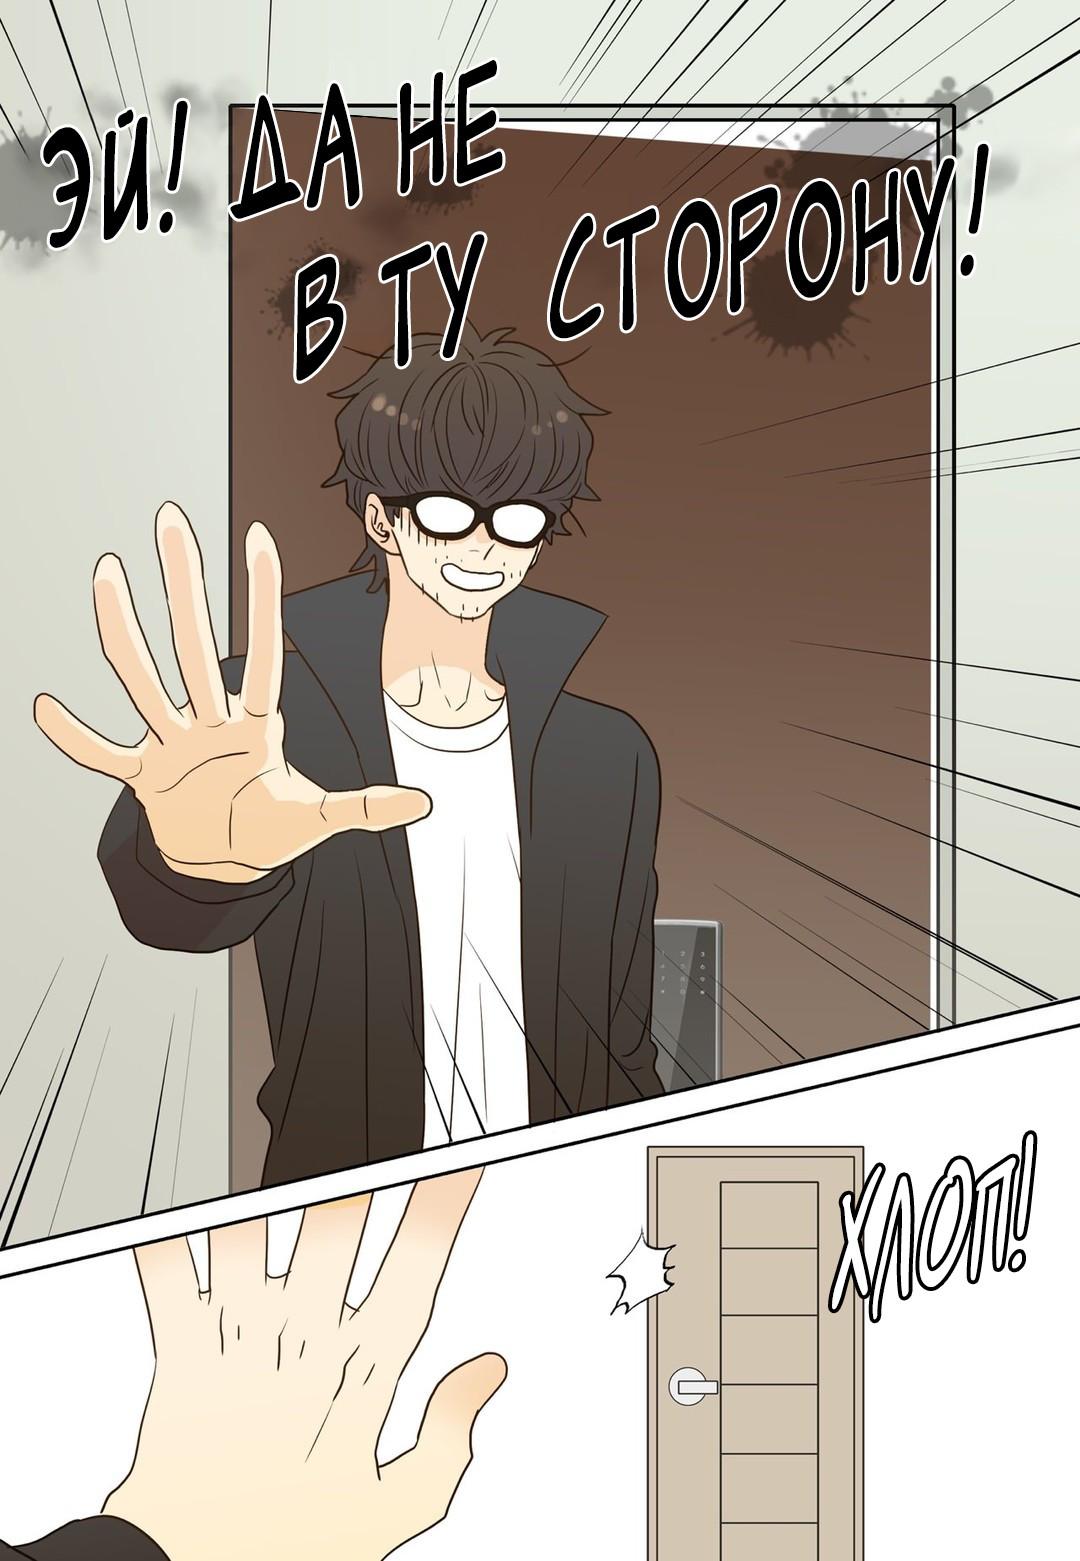 https://r1.ninemanga.com/comics/pic2/46/33774/415555/1531246230370.jpg Page 3